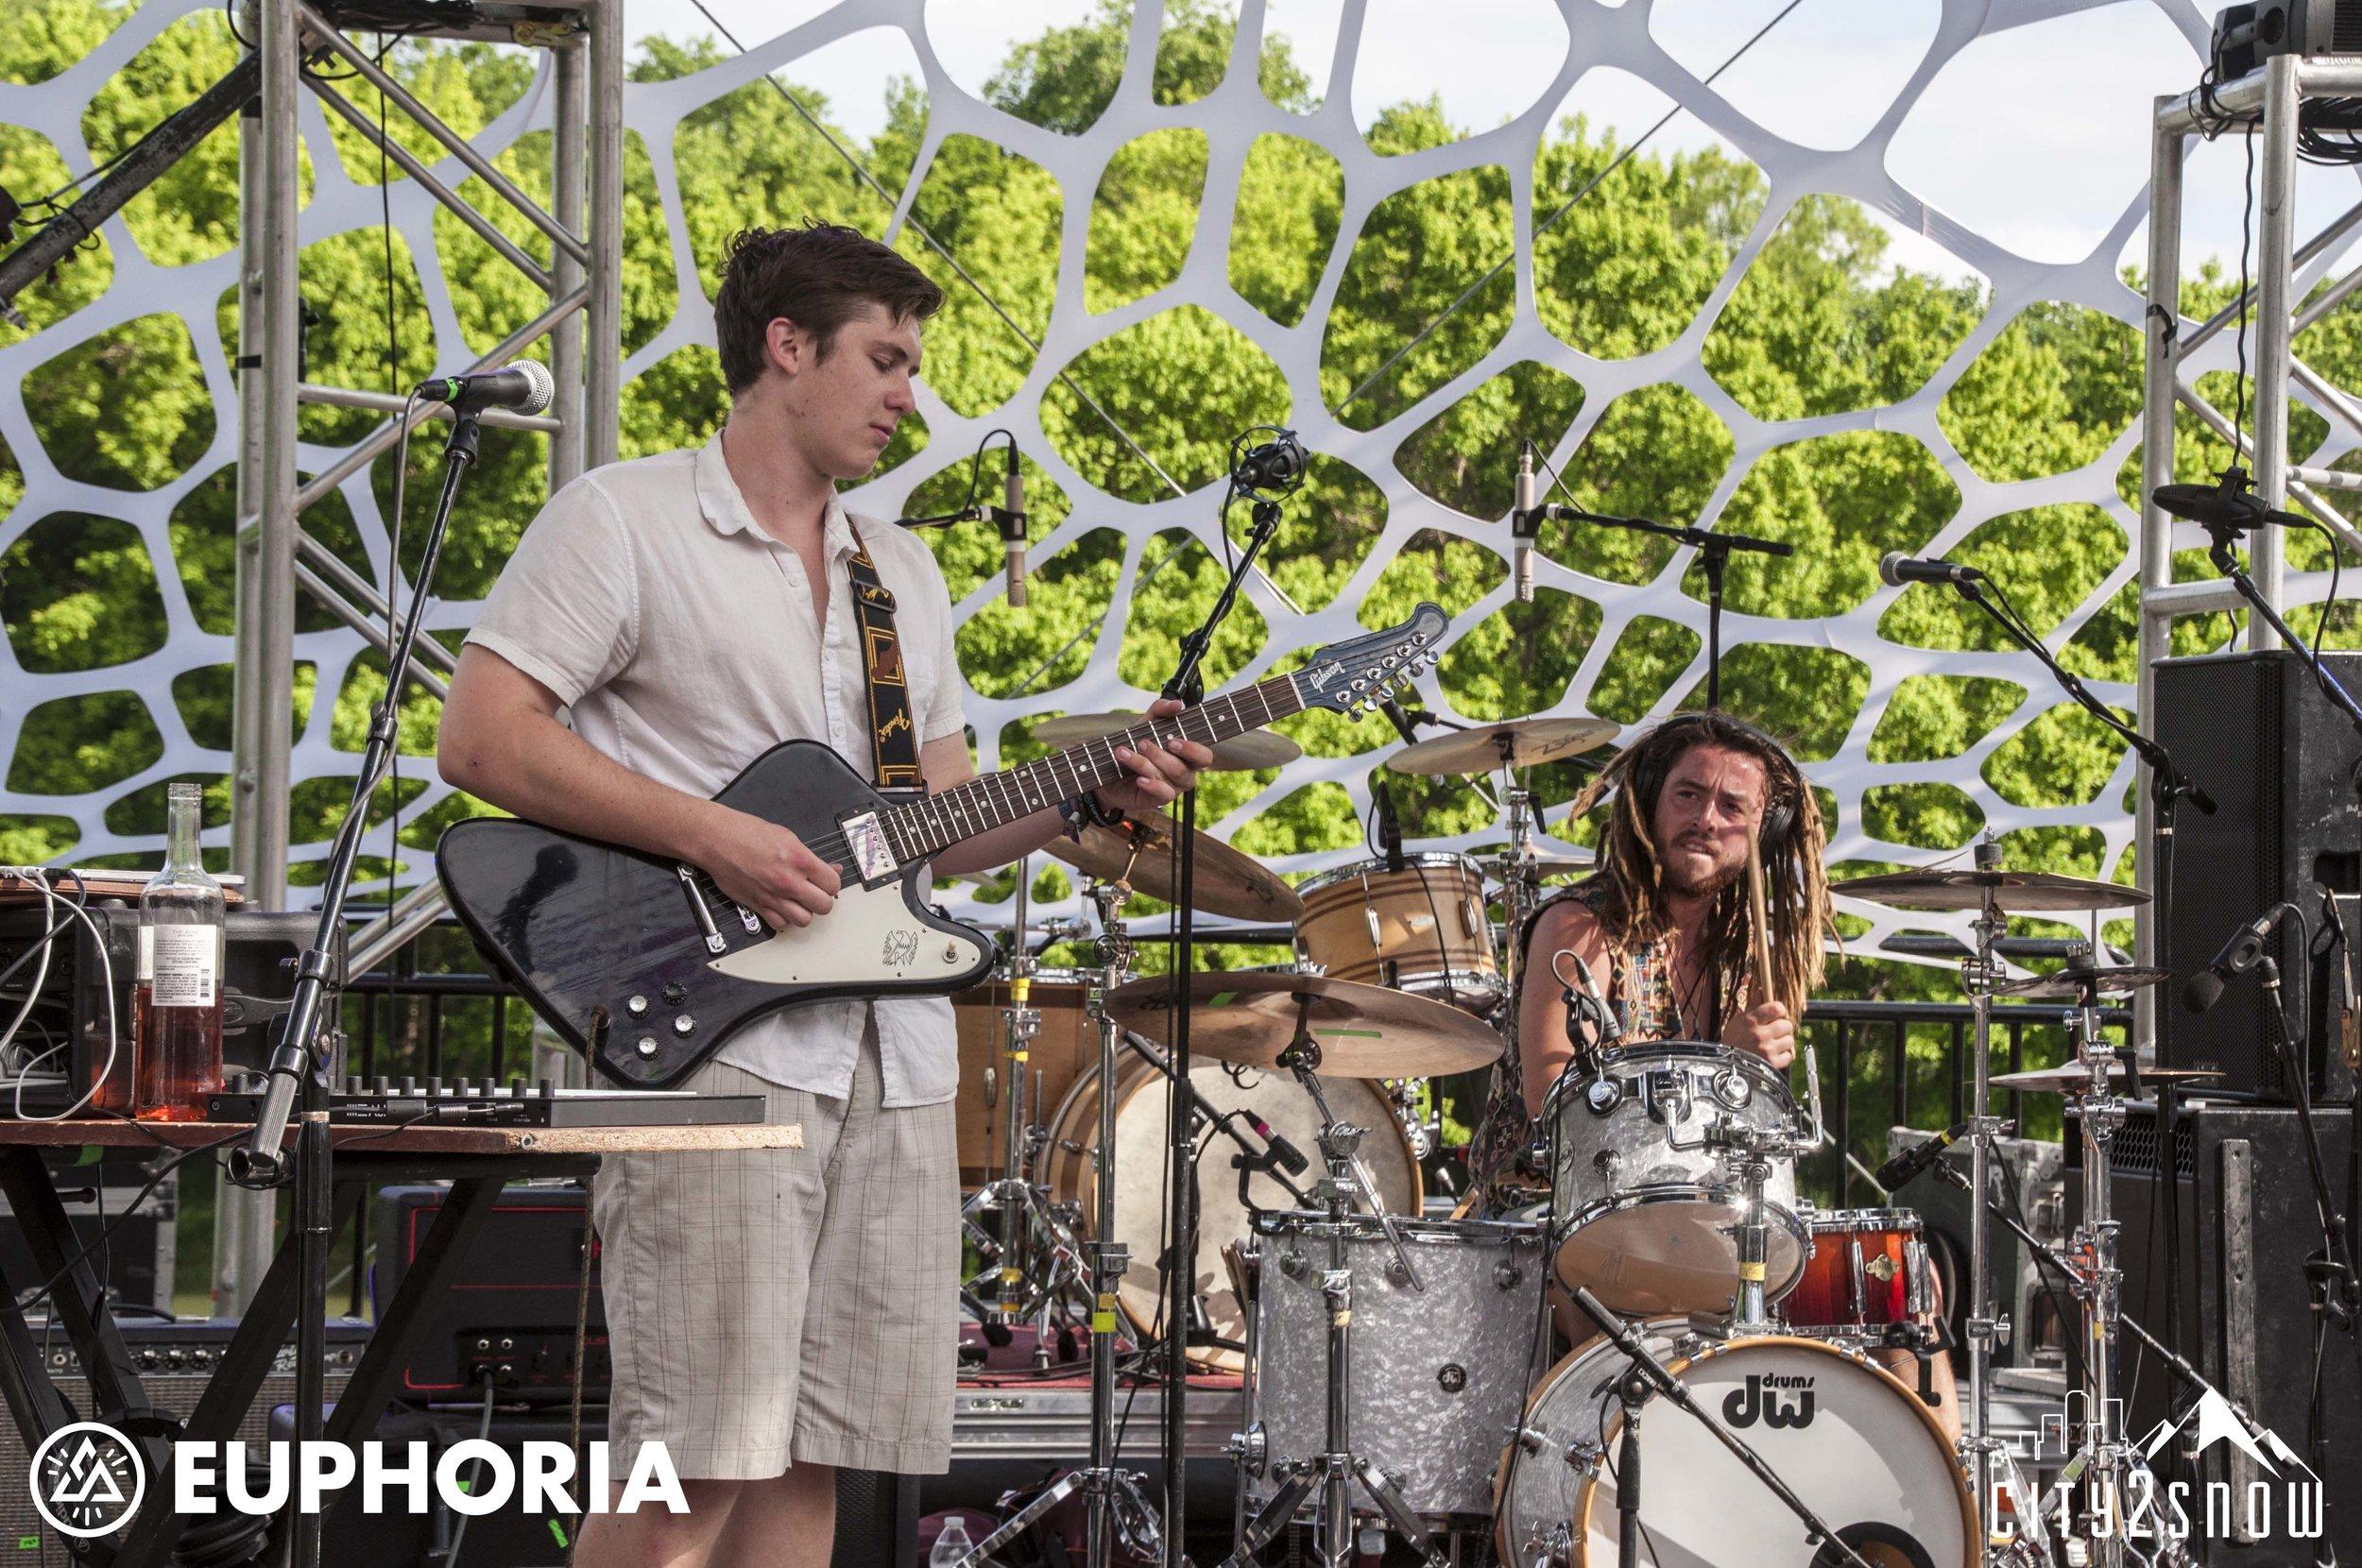 Euphoria-Music-Festival-2017-40.jpg